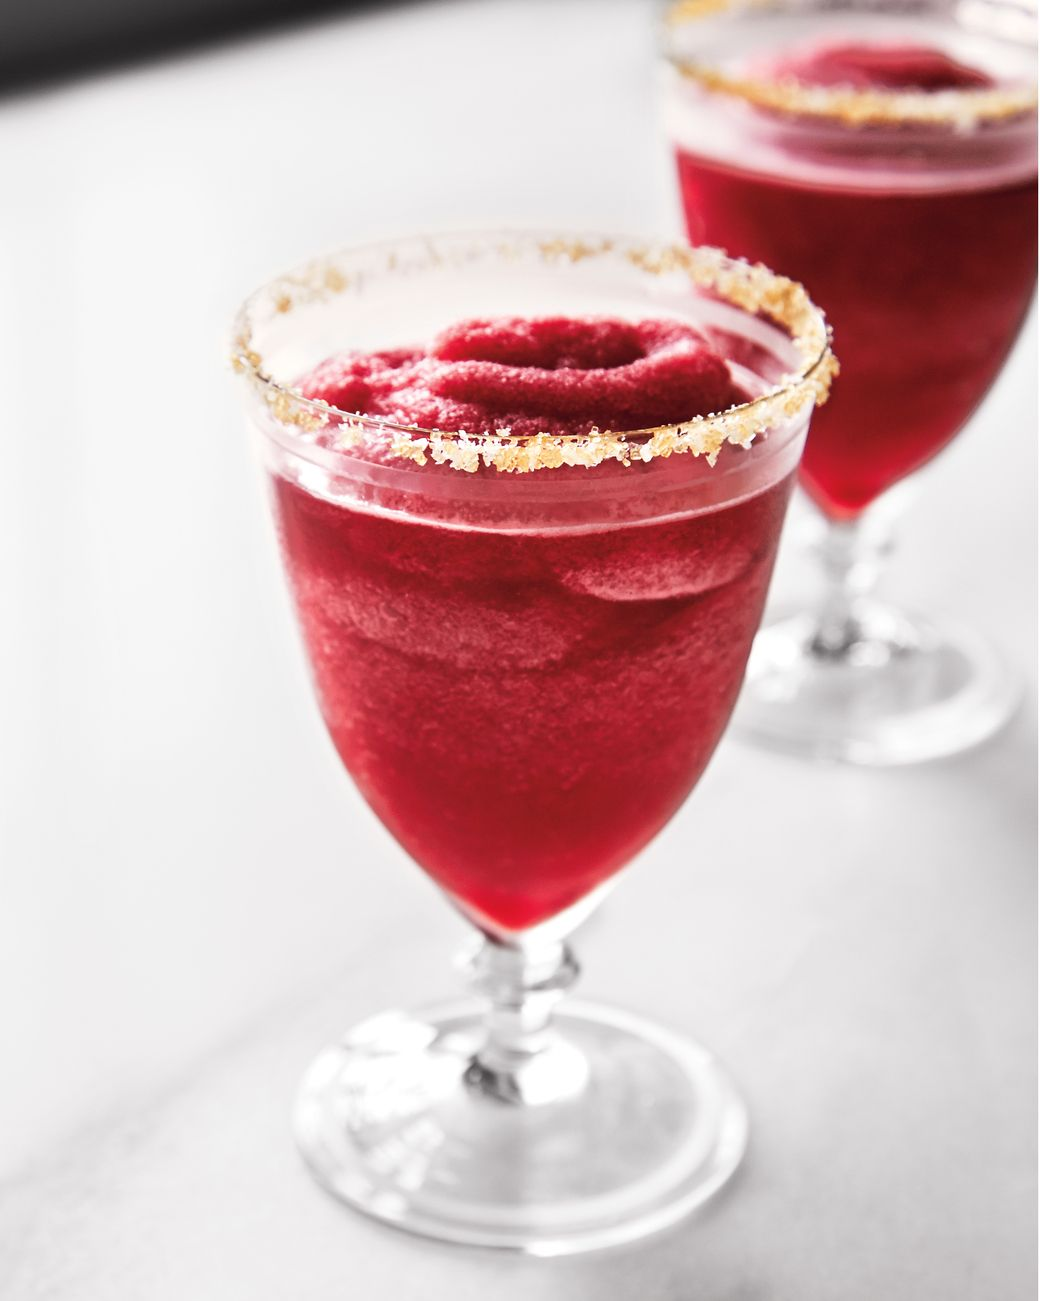 Pomegranate Margarita Recipe: Frozen Pomegranate Margaritas